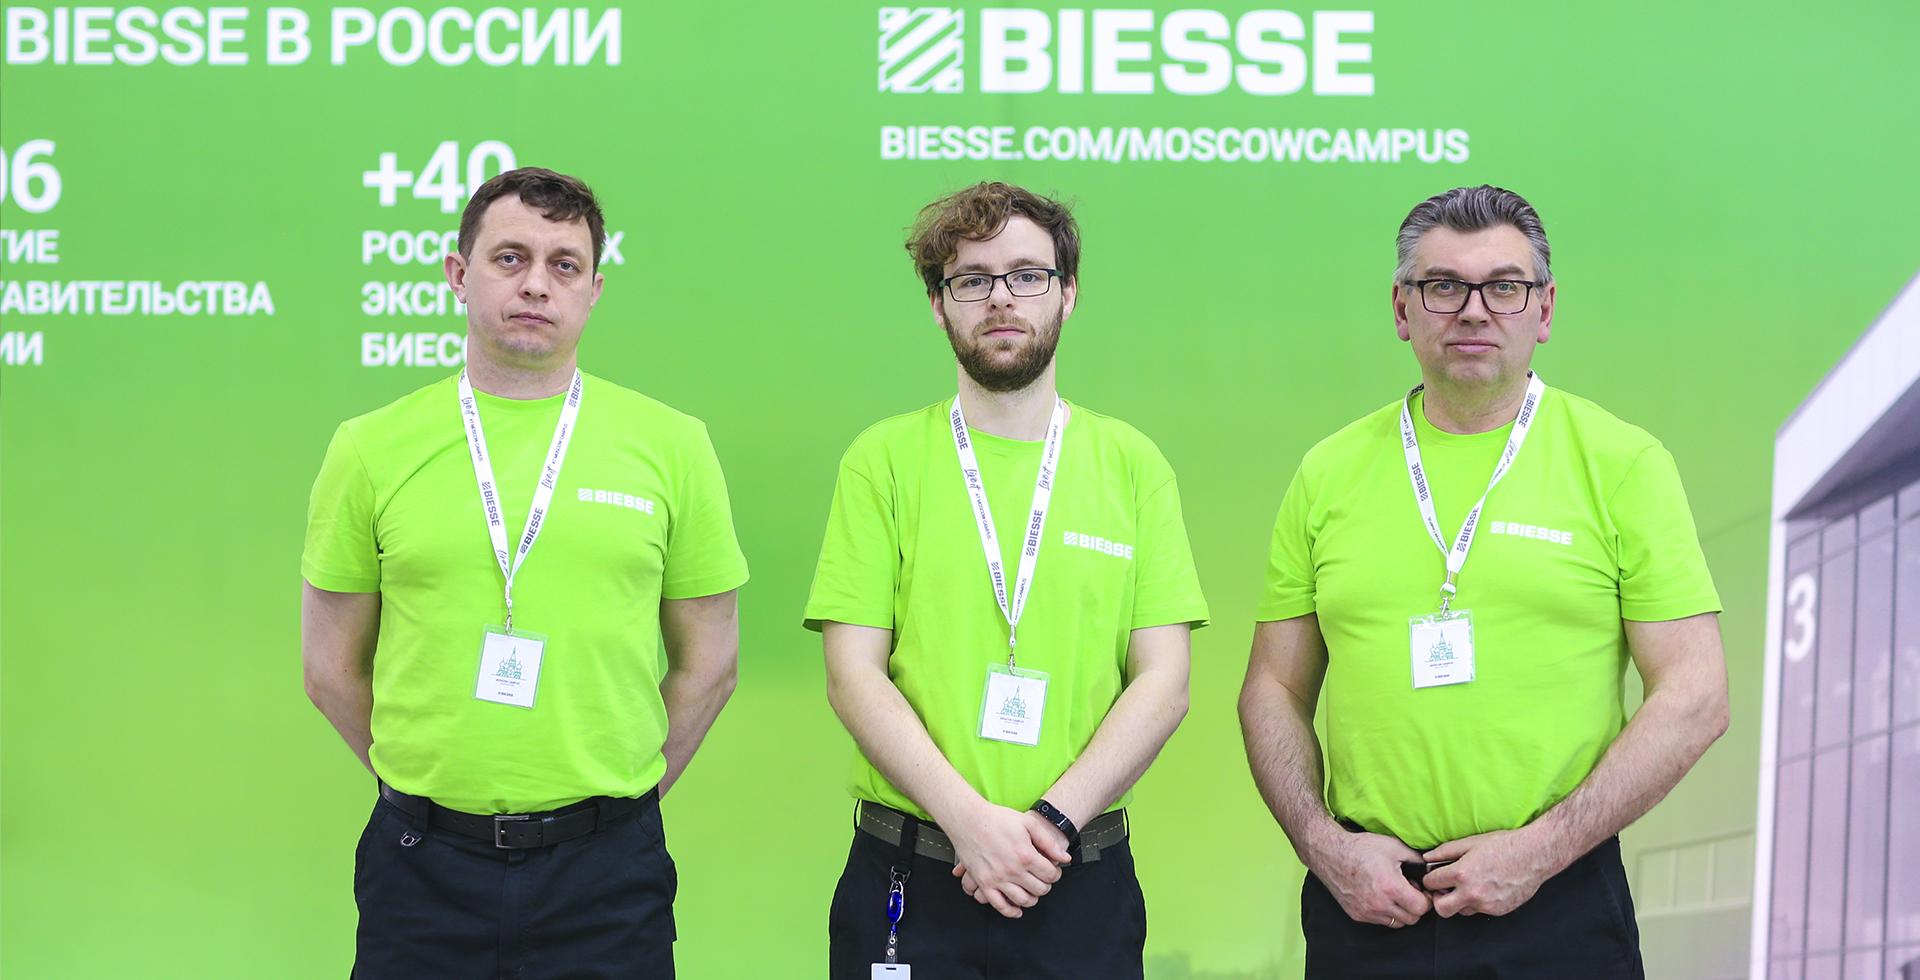 Inside Biesse в России 2020: Фото 7